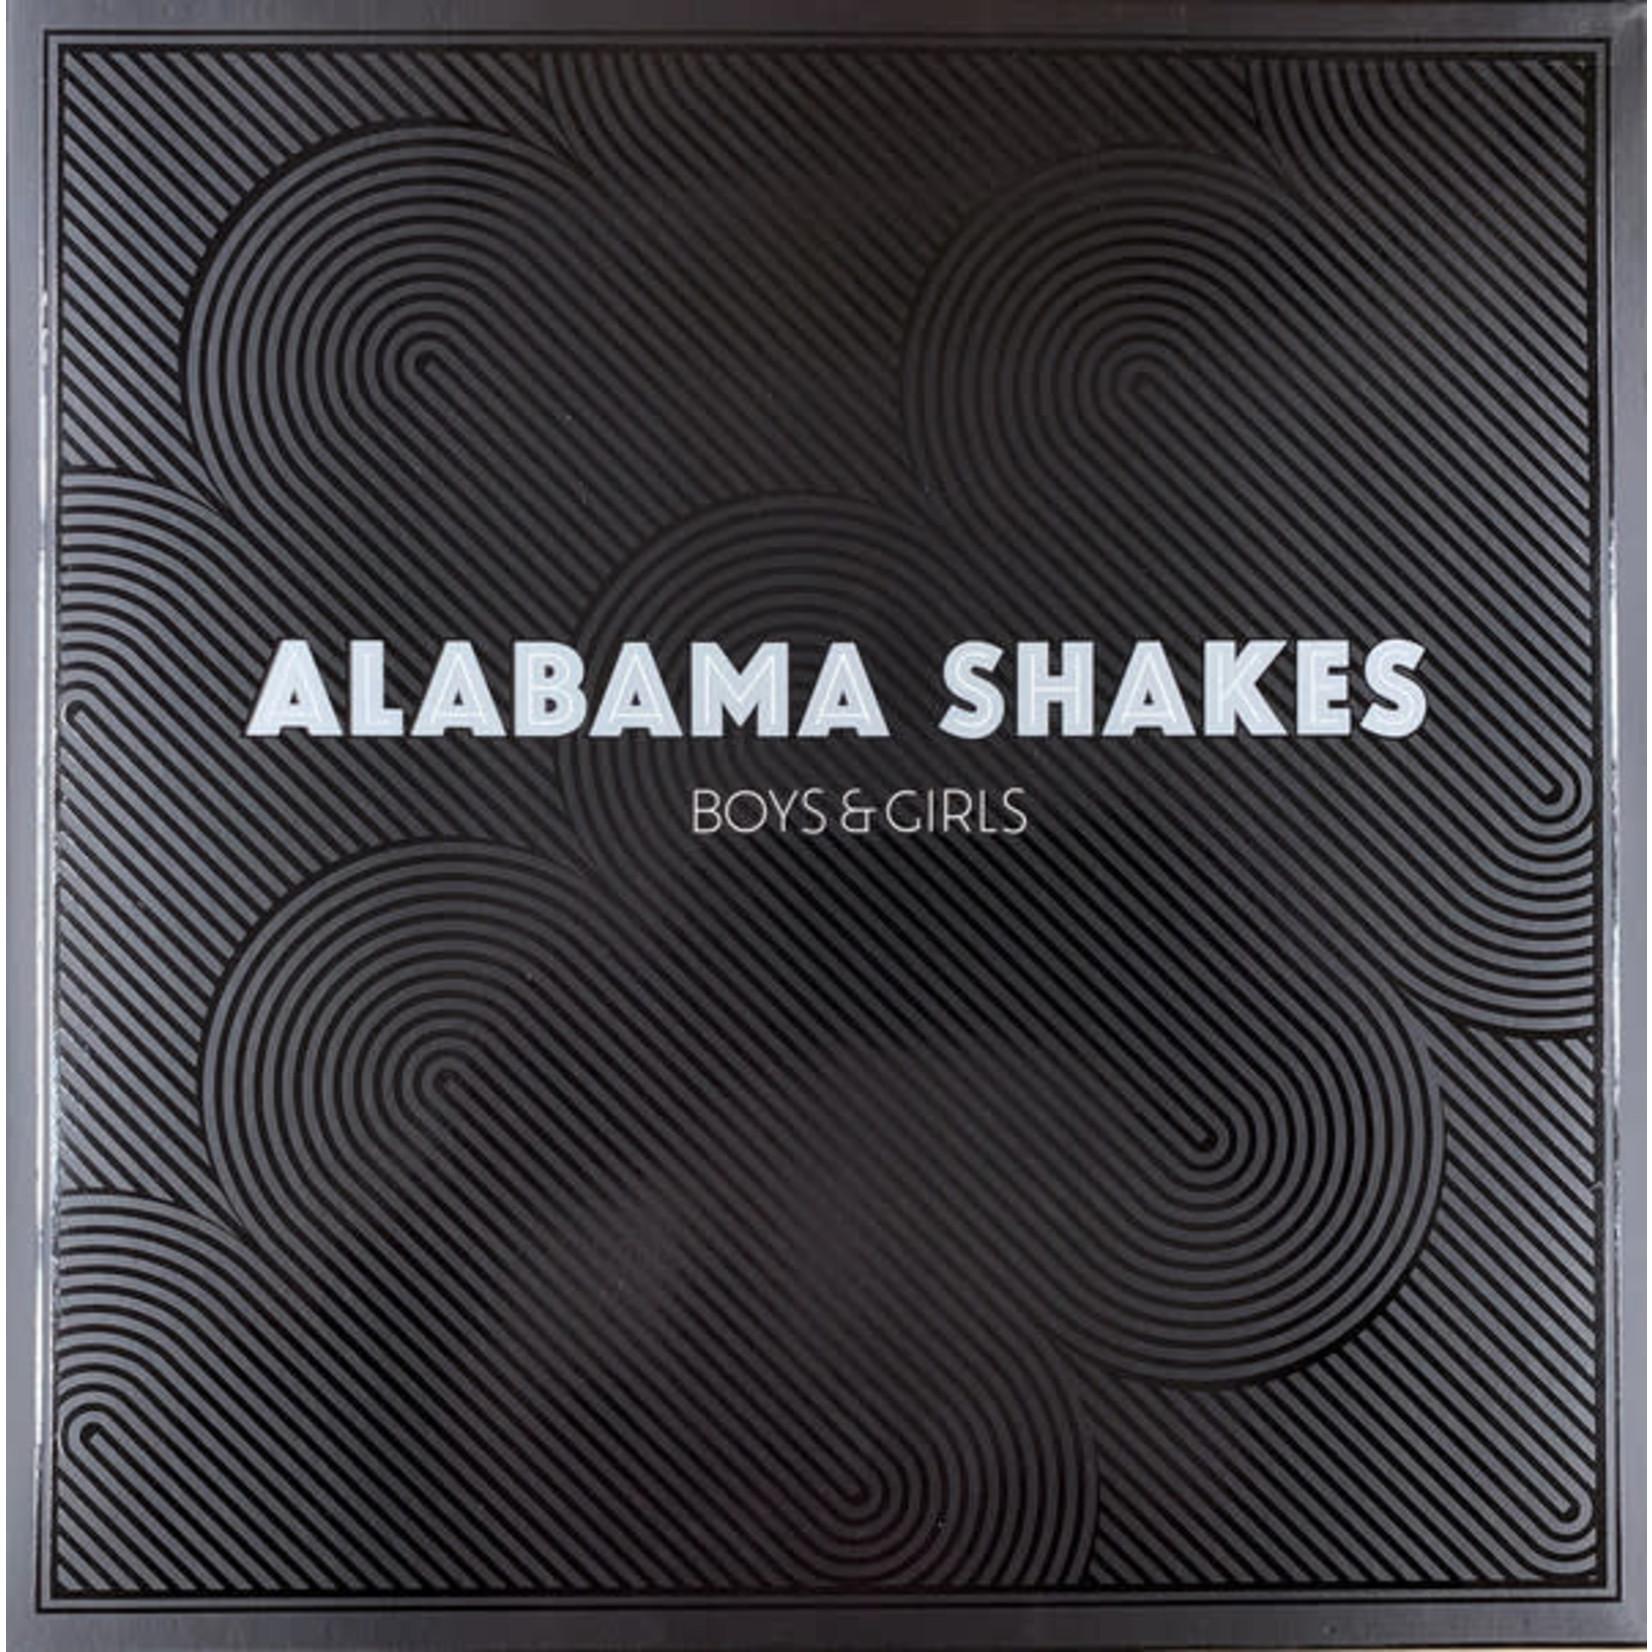 ALABAMA SHAKES BOYS & GIRLS (LP)